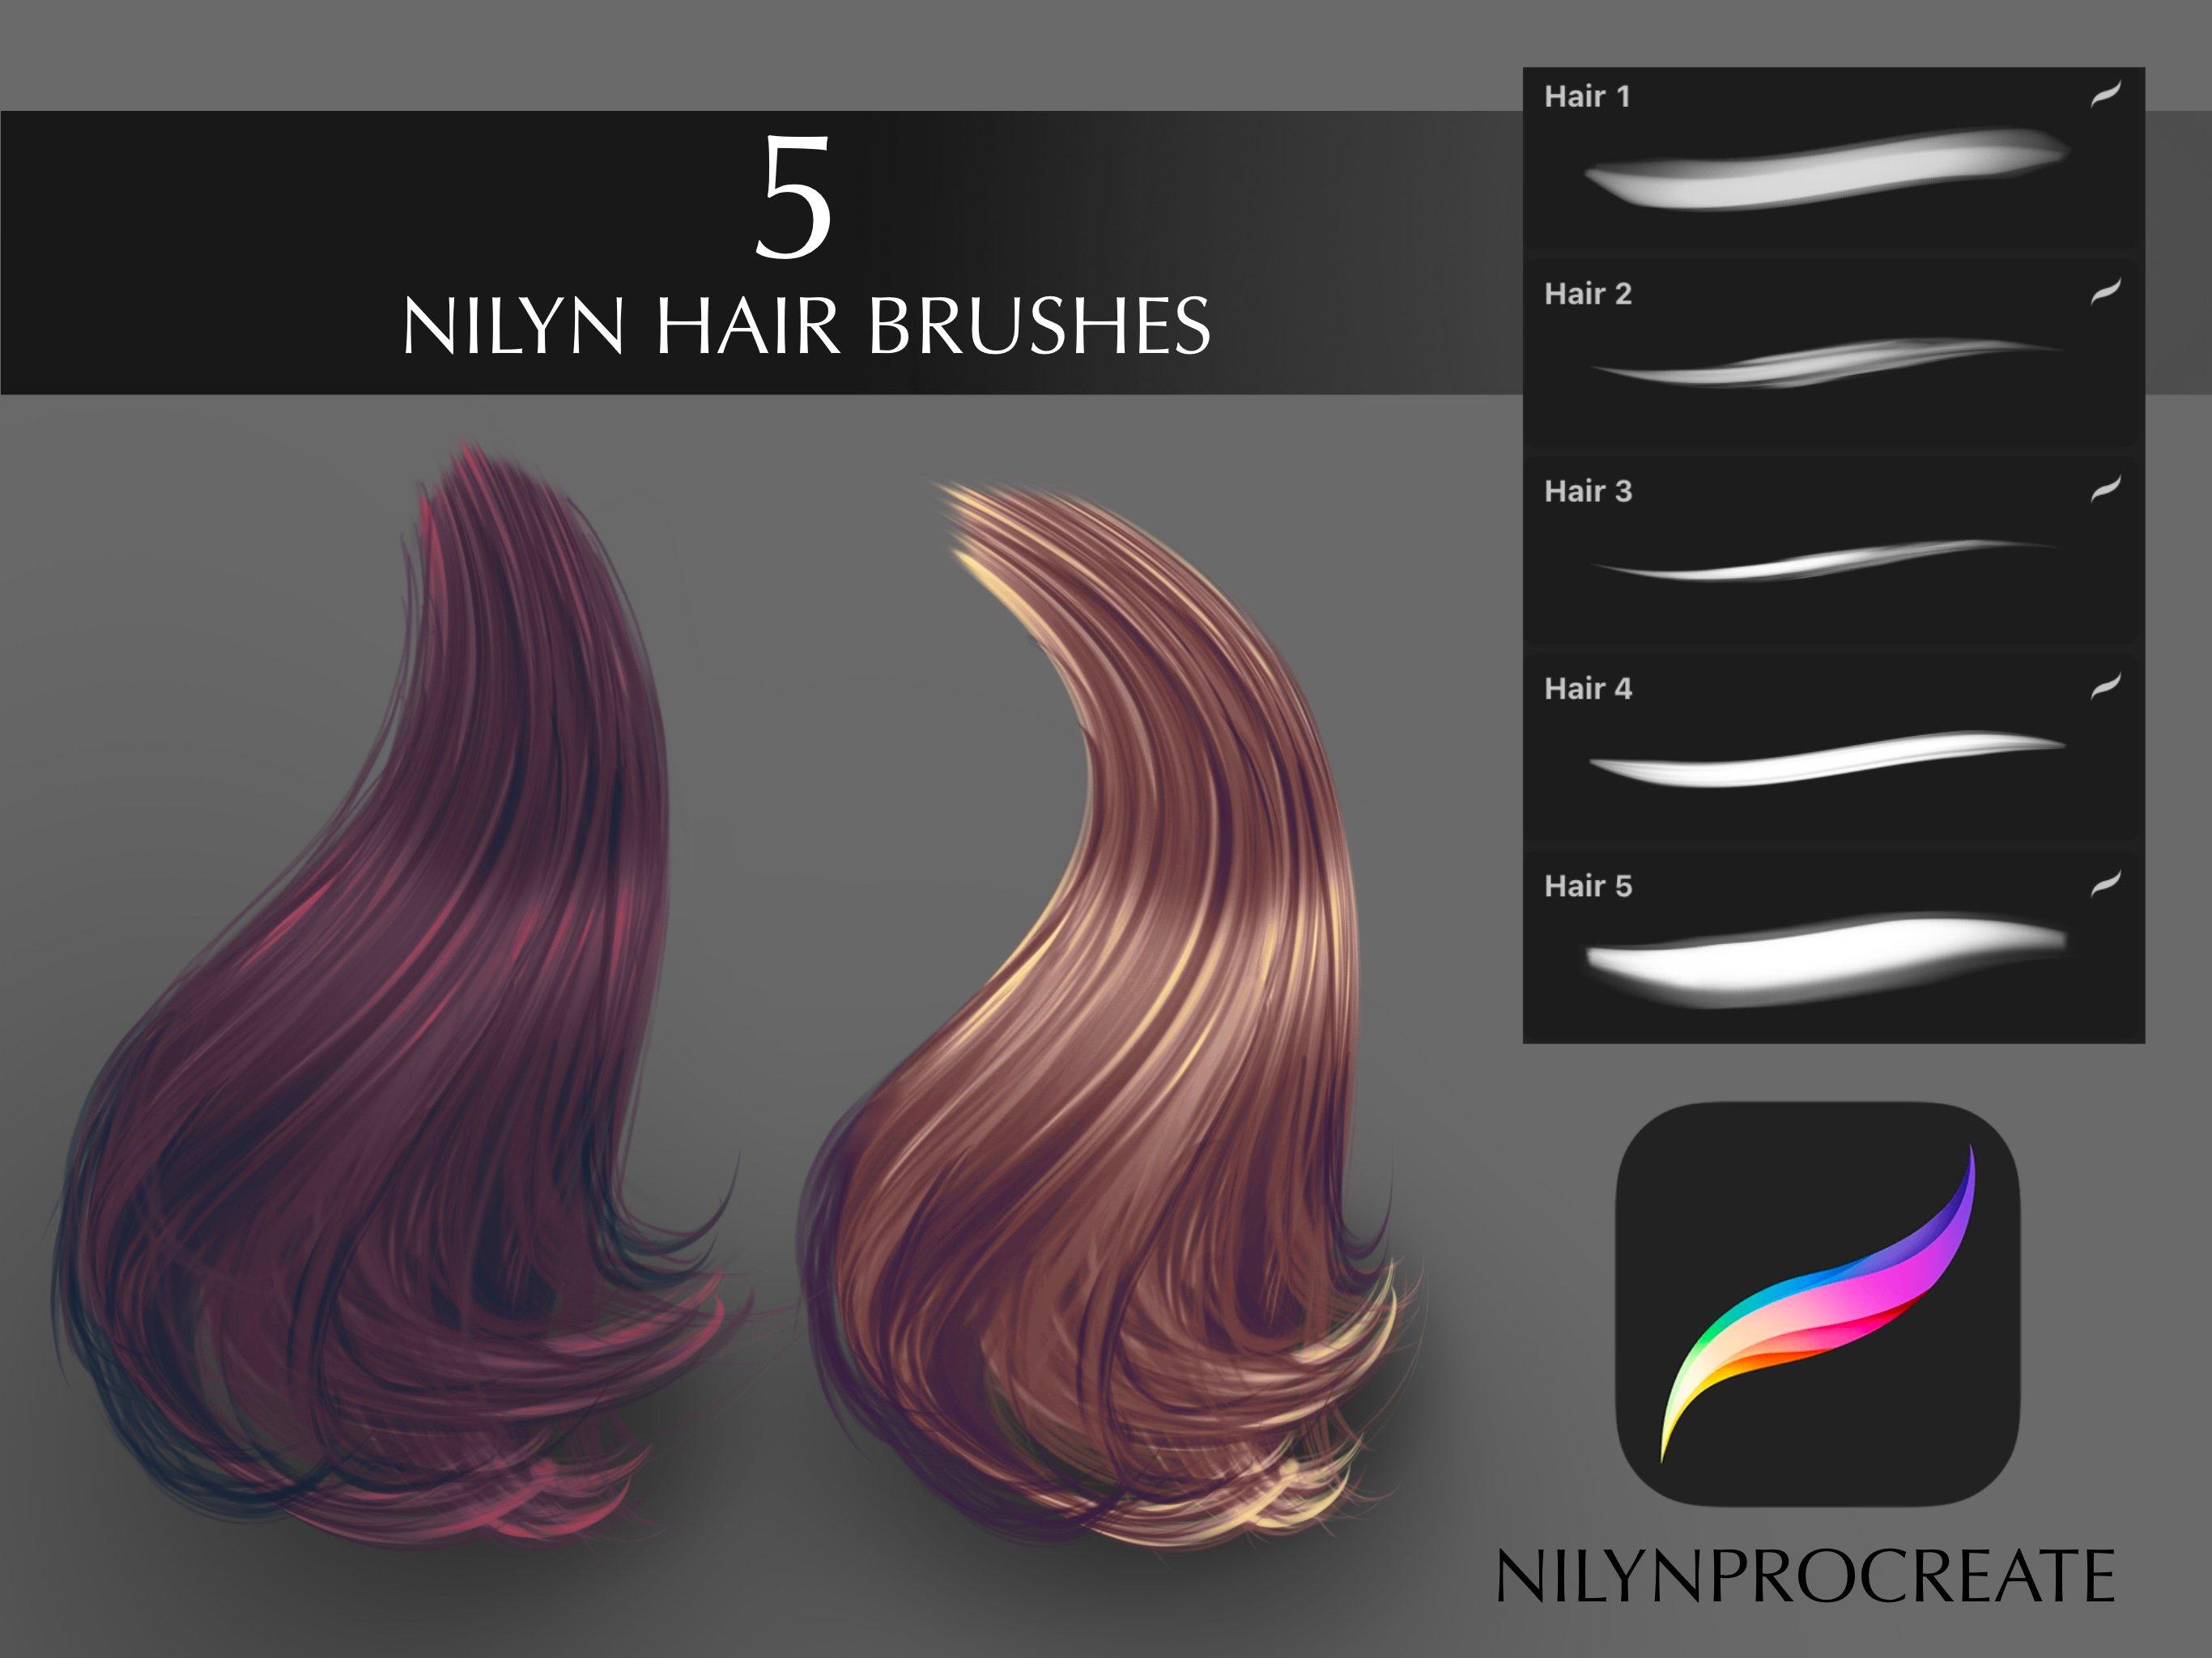 Nilyn Procreate - 5 Hair Brushes set ver.2 FREE